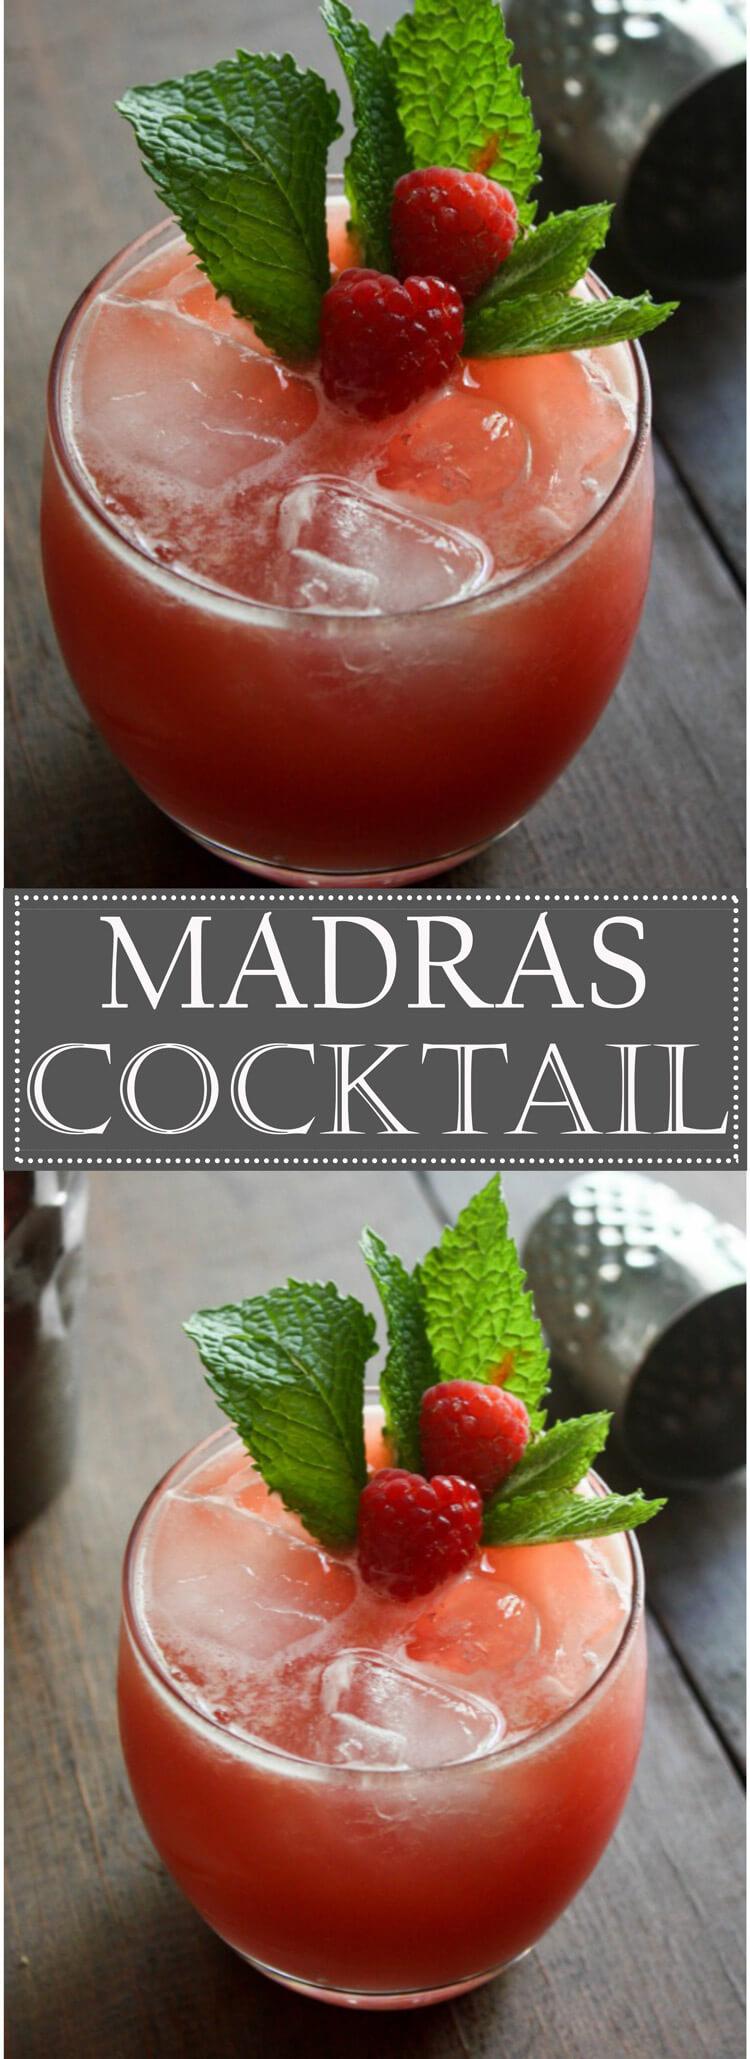 Madras Cocktail 1